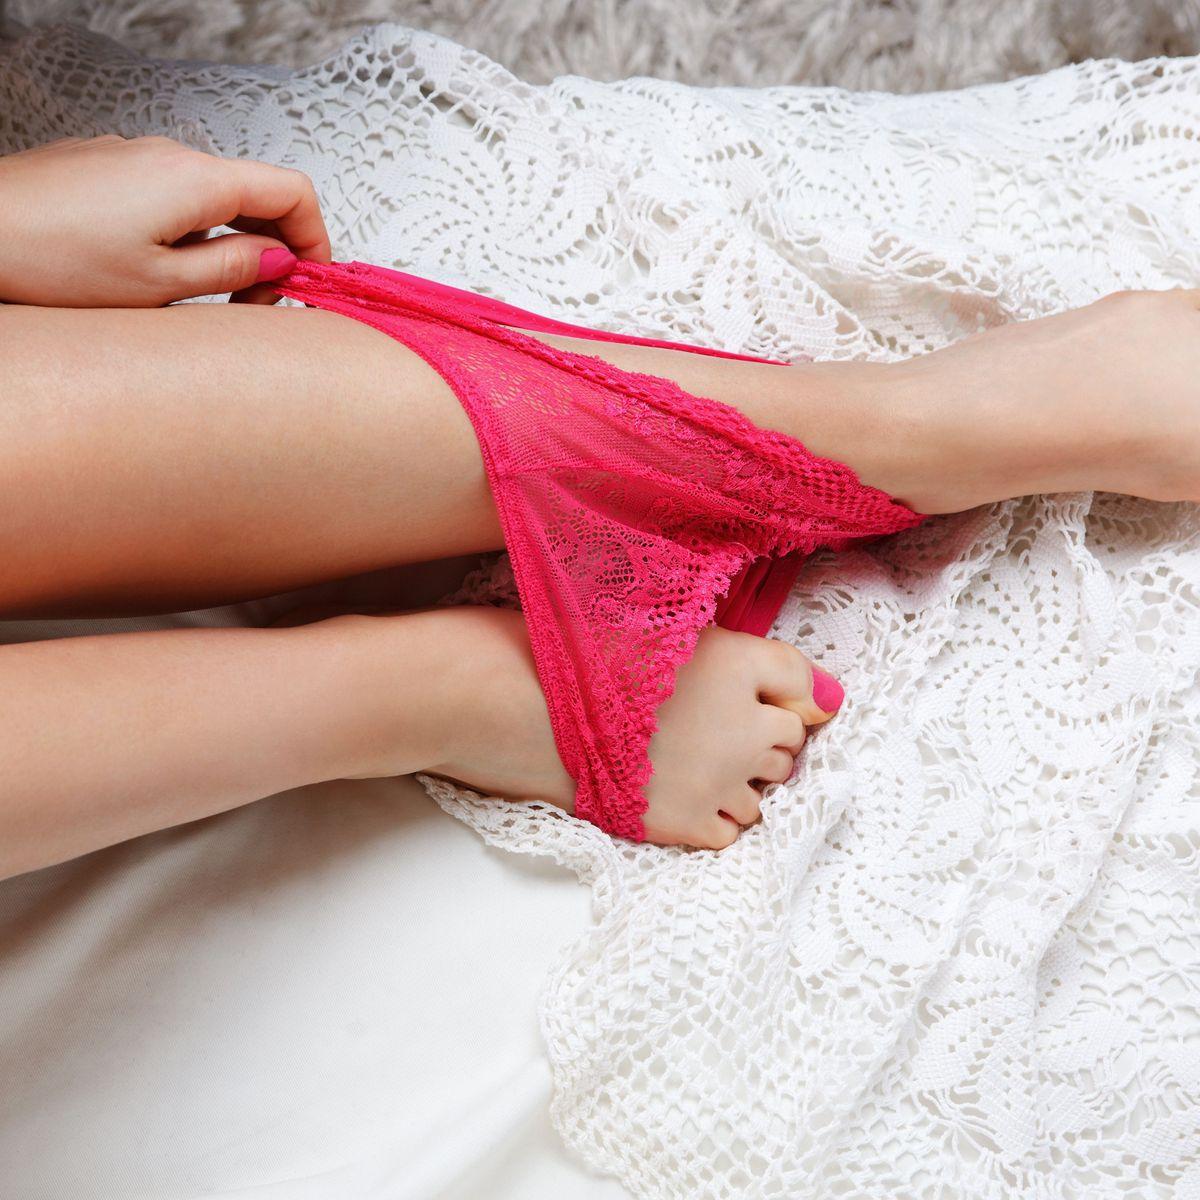 Stiftung warentest sexspielzeug